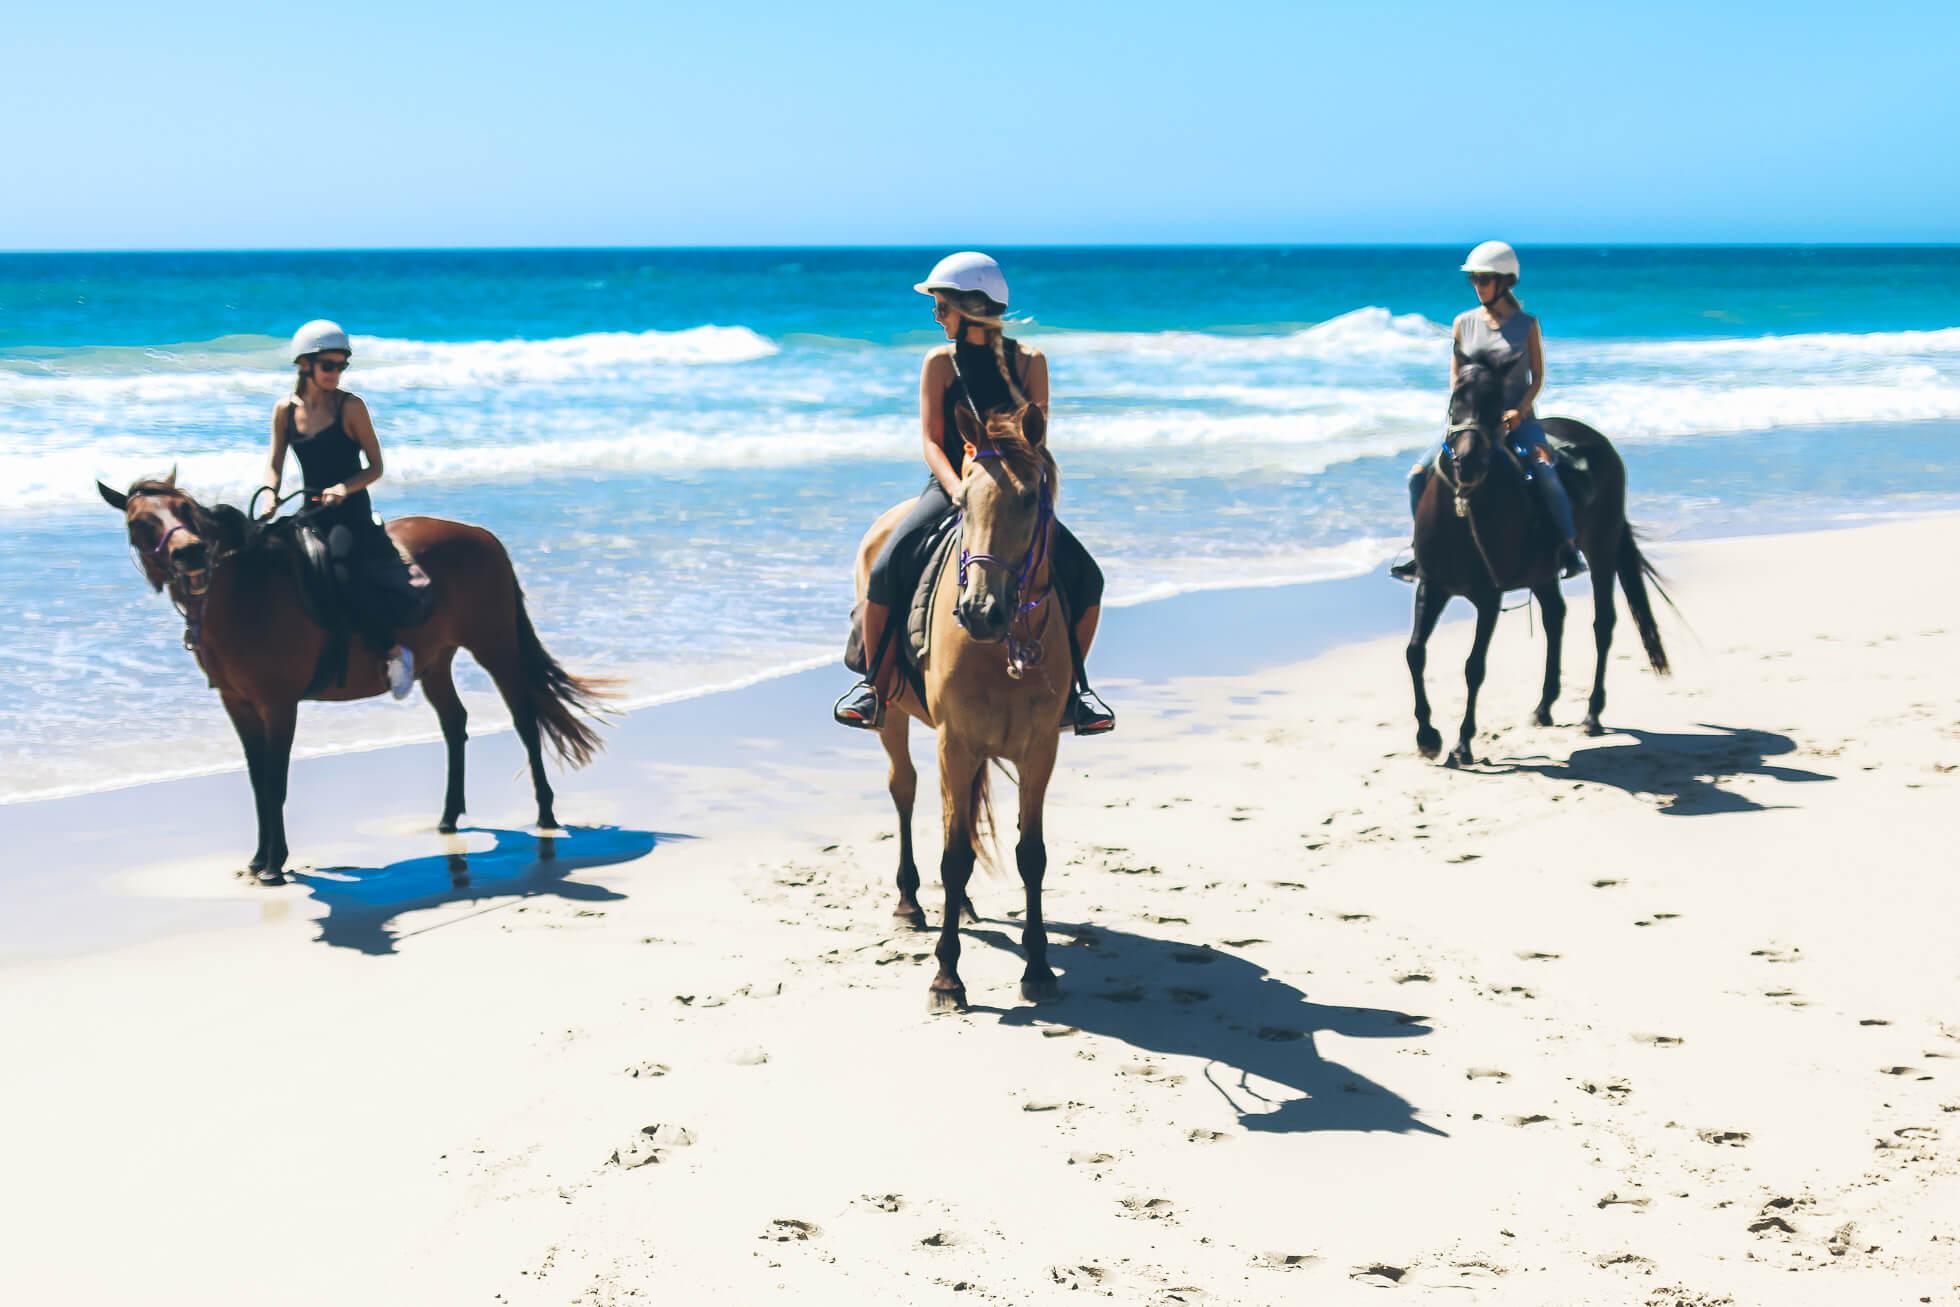 janni-deler-horseback-riding-byronbayIMG_1487